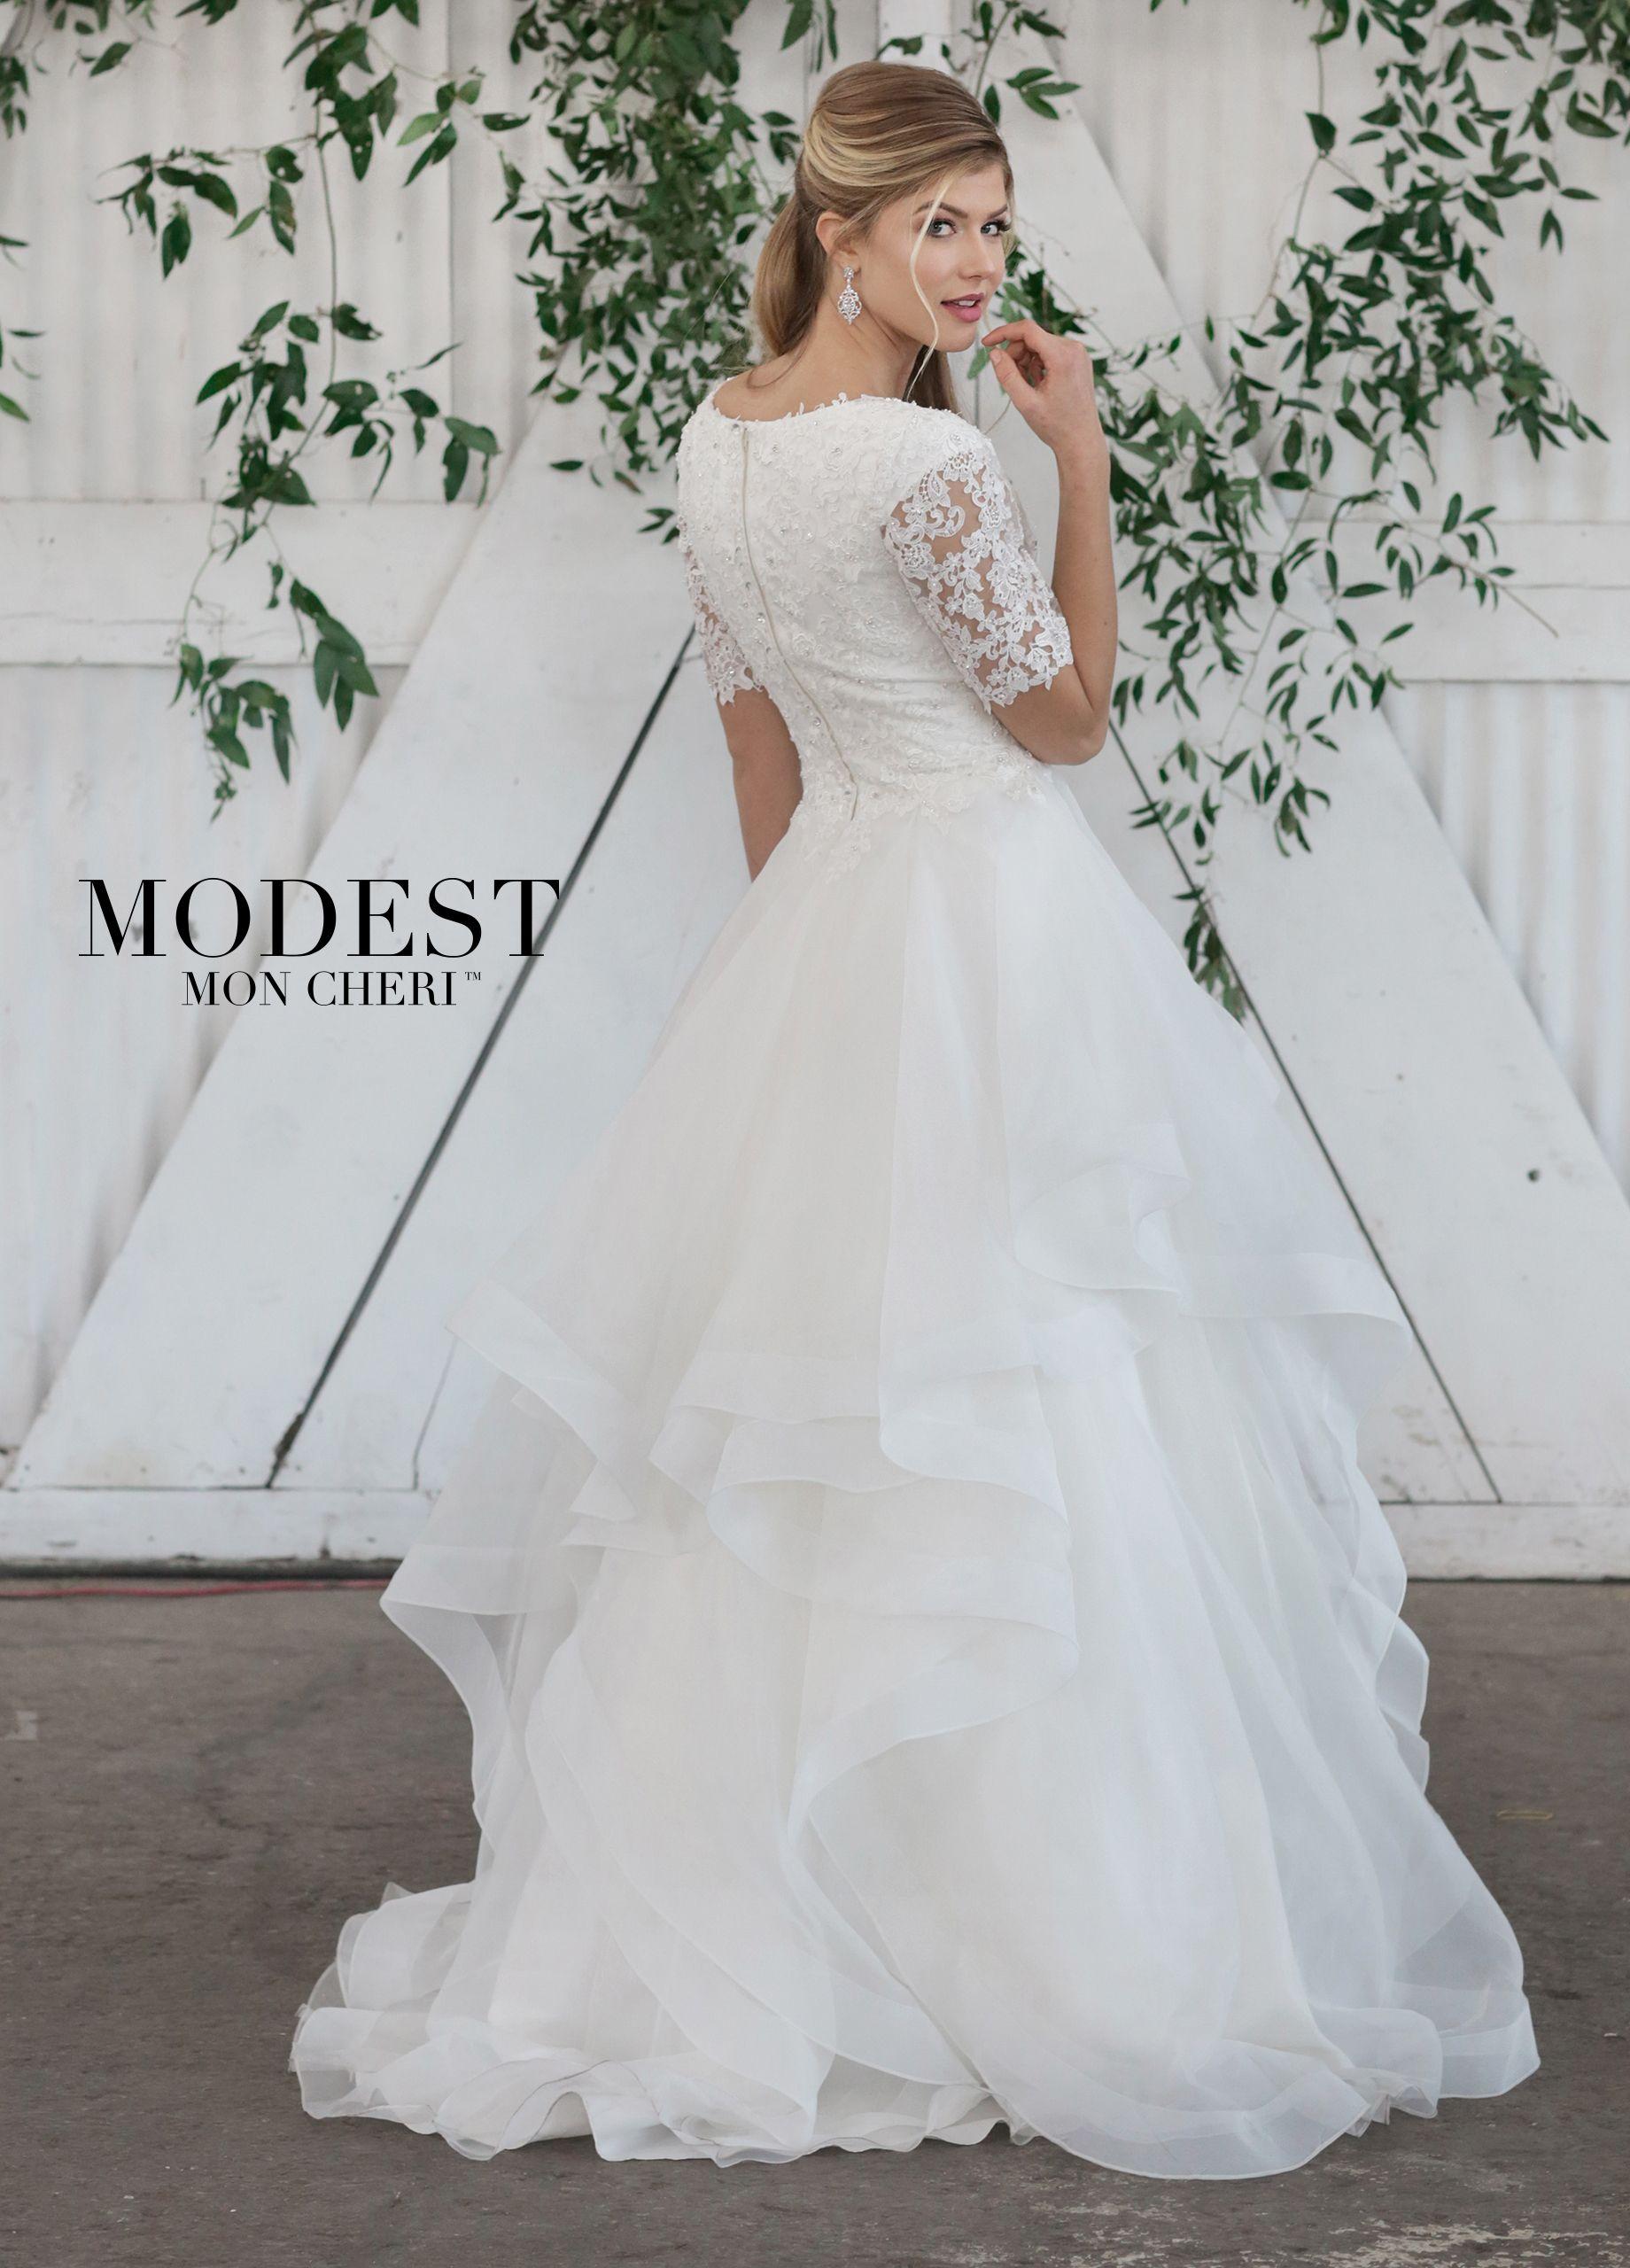 Unique Wedding Dresses Spring 2019 Martin Thornburg Ball Gowns